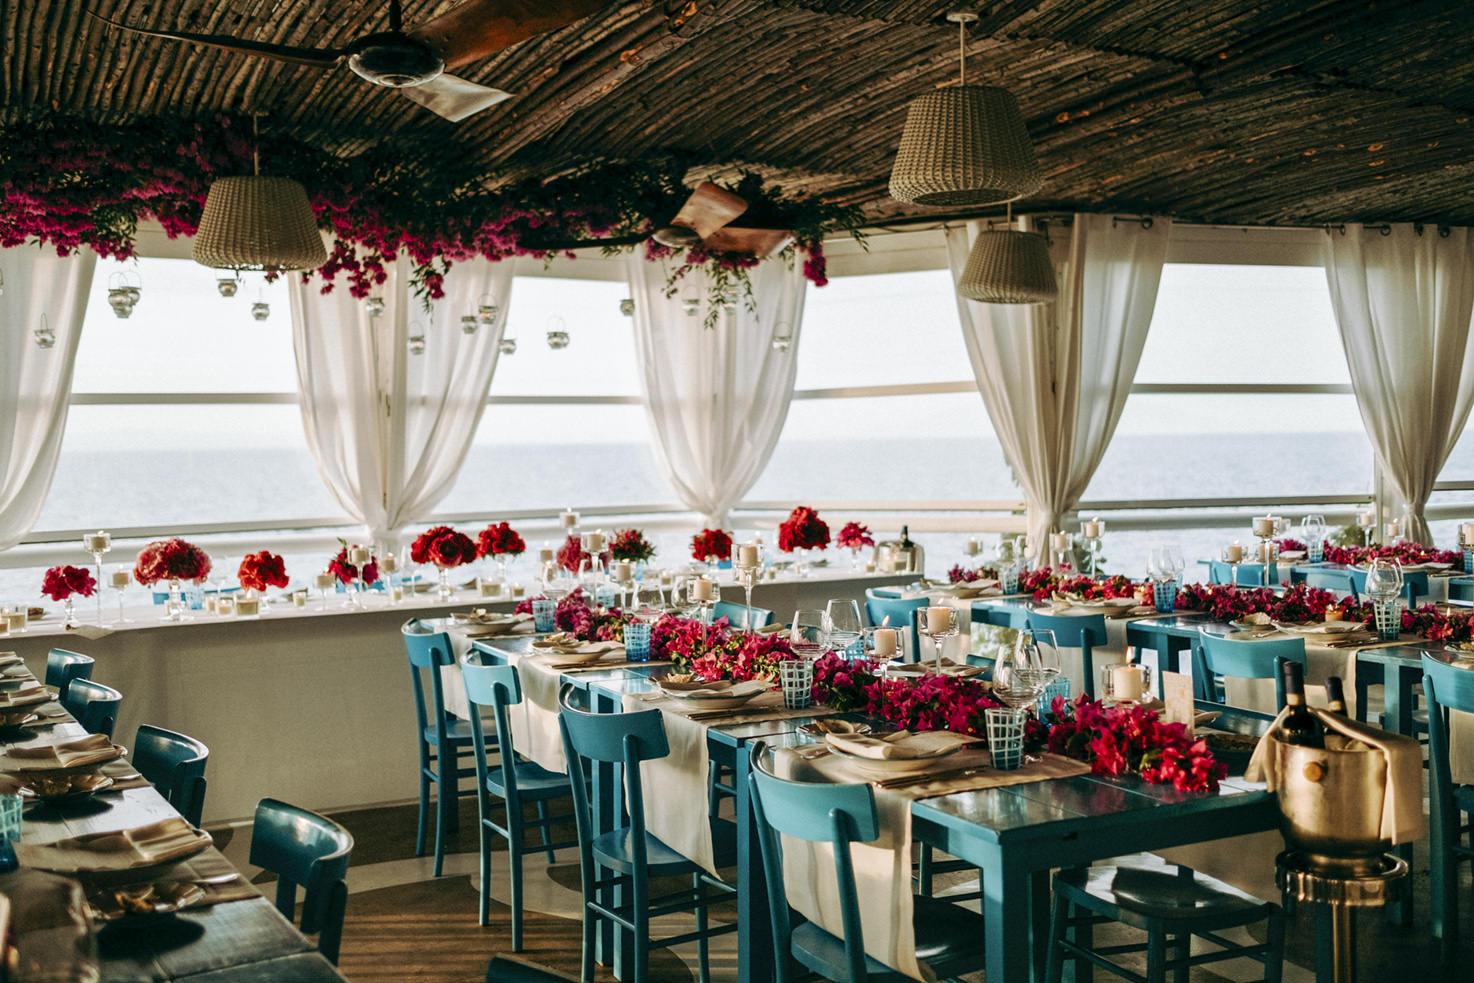 Wedding reception at Il Riccio restaurant